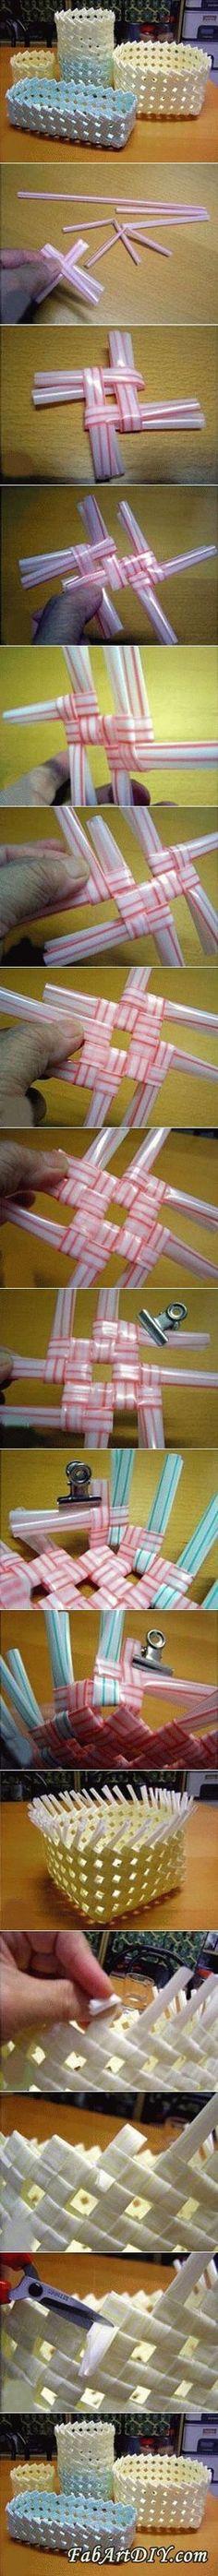 DIY Drinking Straw Basket Organizer Tutorial: Using Drinking Straw to Weave a Basket or Organizer for Home Storage and Decoration. Fun Crafts for Kids, too. Cute Crafts, Creative Crafts, Crafts To Make, Crafts For Kids, Arts And Crafts, Paper Crafts, Diy Crafts, Diy Projects To Try, Craft Projects